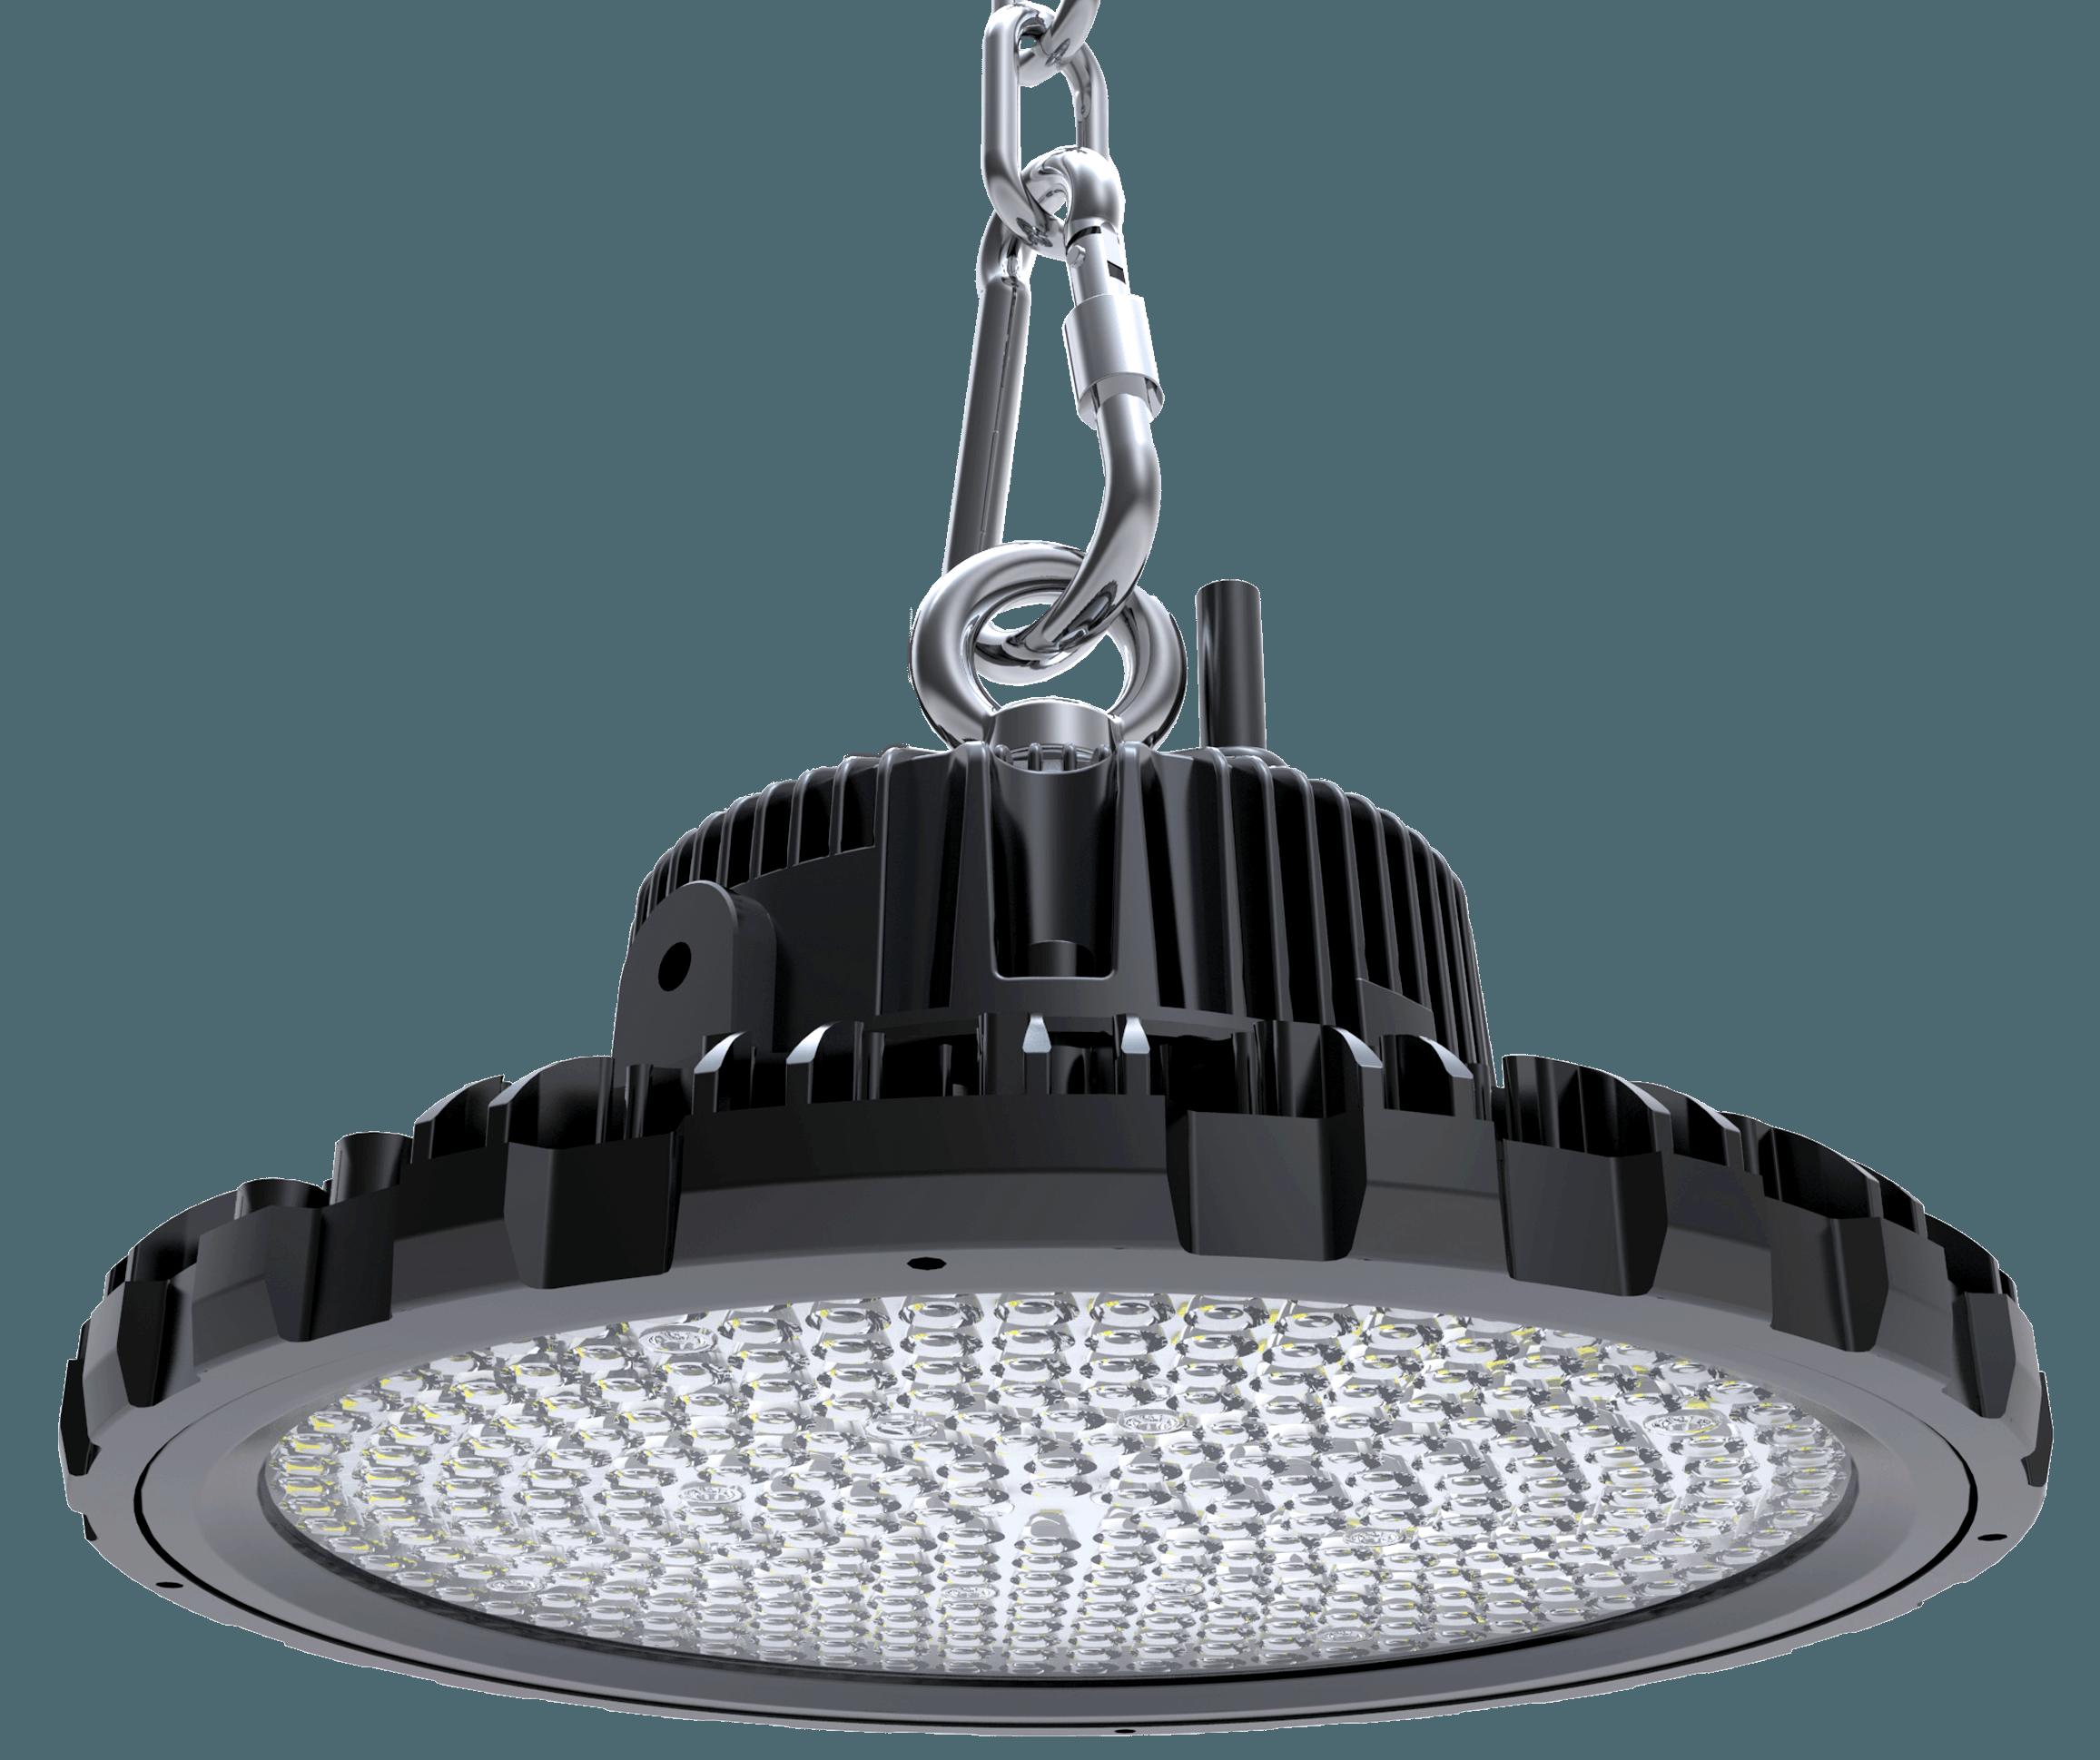 UFO LED HighBay Light 150W 135Lmw, IP65 Waterproof